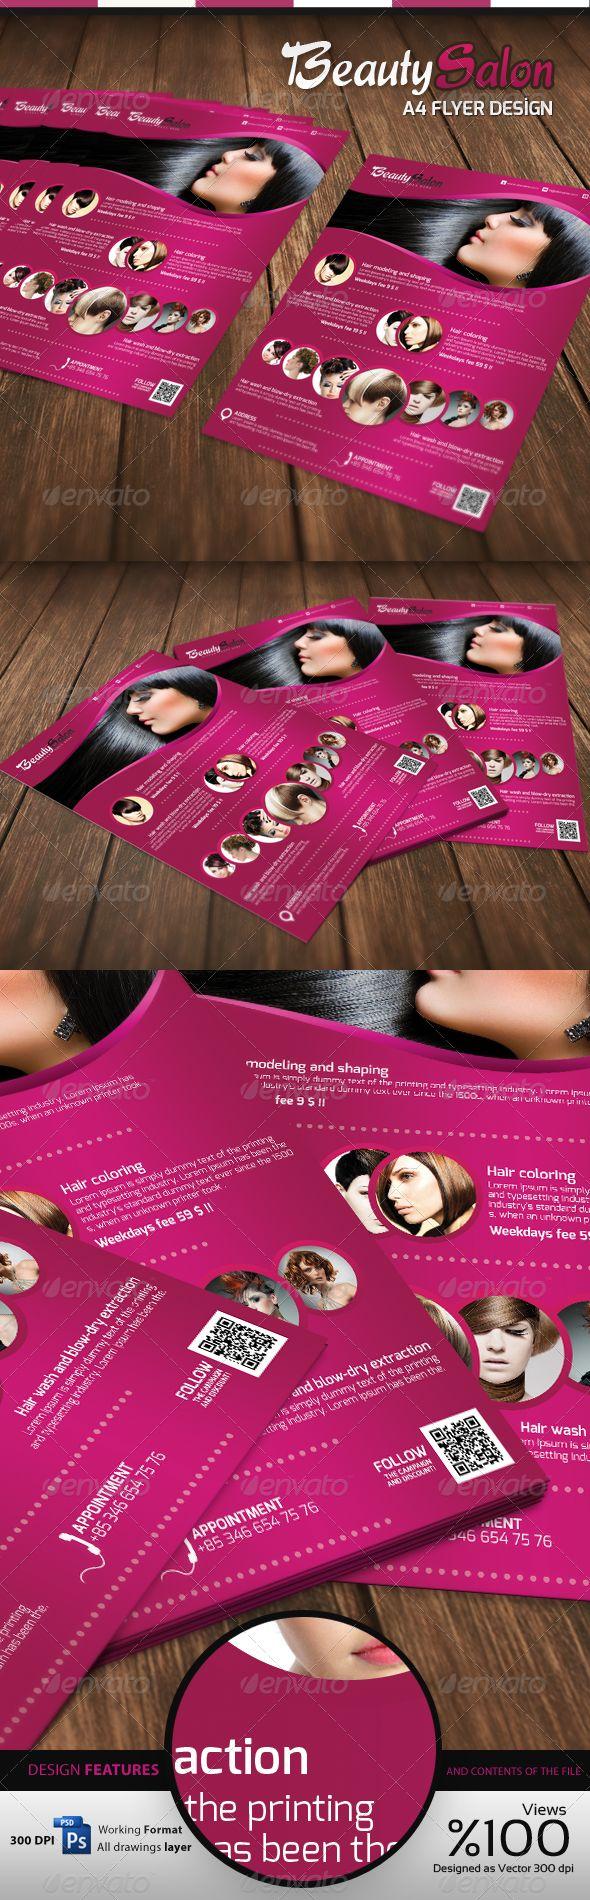 Beauty Salon - A4 Flyer. Customizable professional template for a flyer. #FlyerTemplate #flyer #party #GraphicTemplate #design #PrintDesign #A4Flyer #beauty #BeautySalon #BeautySalonA4Flyer #BeautySalonFlyer